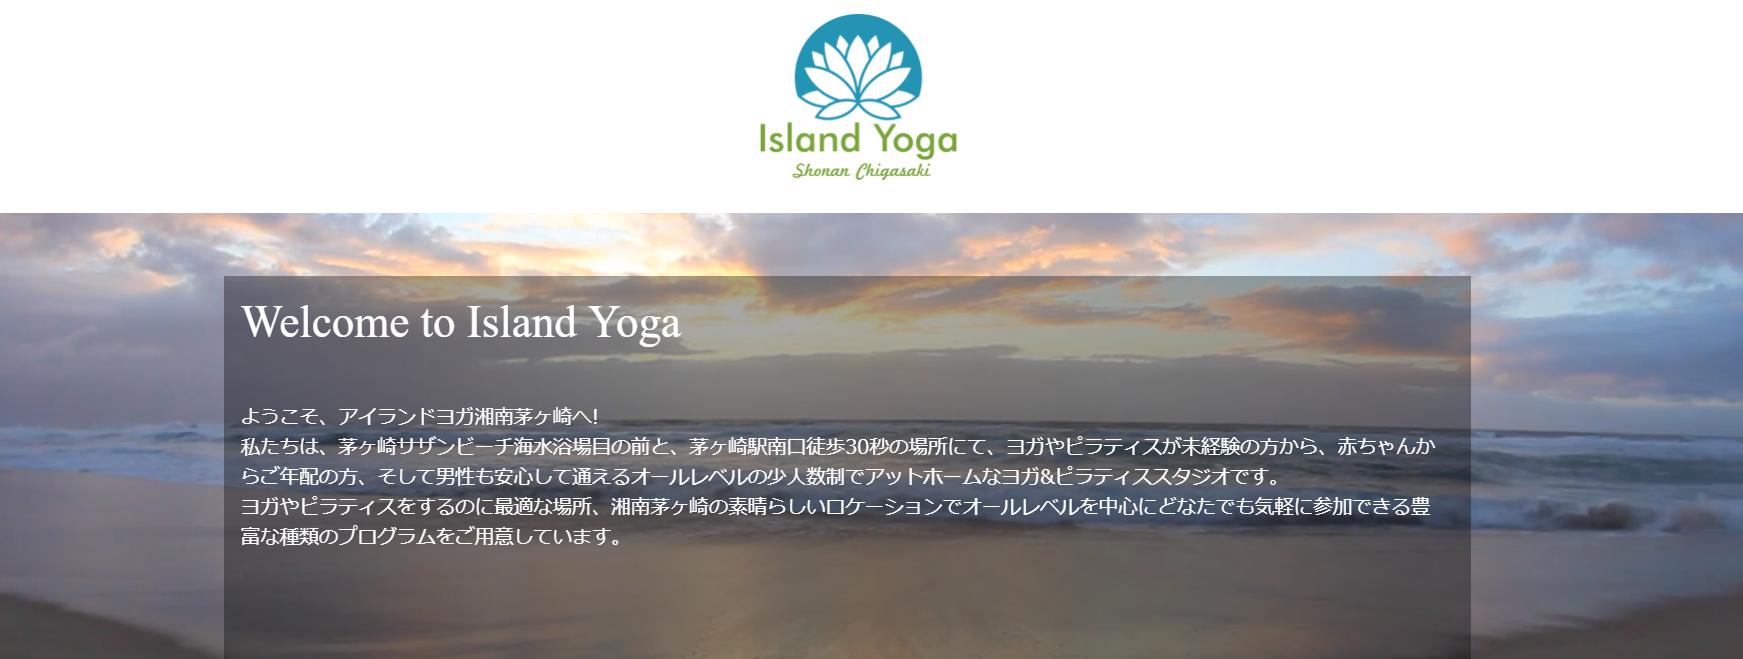 Island Yoga(アイランドヨガ)